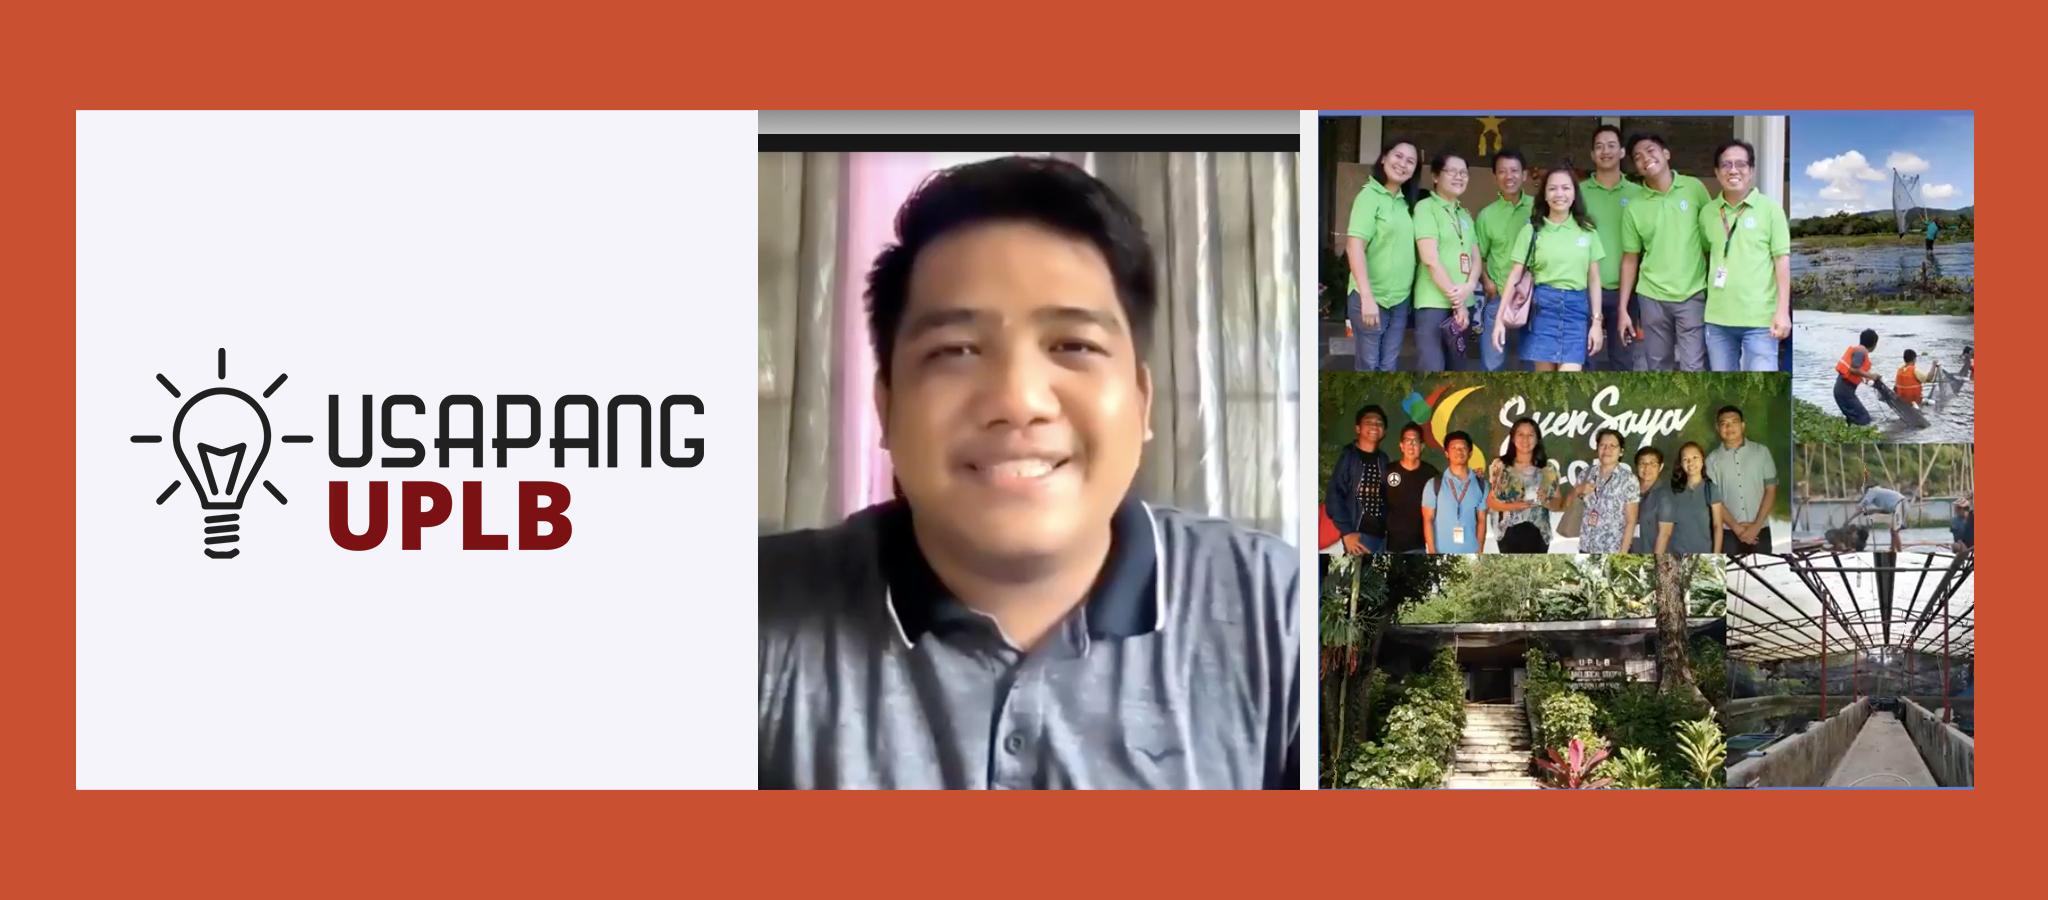 Usapang UPLB tackles DOST scholarships, rejuvenation of fish populations